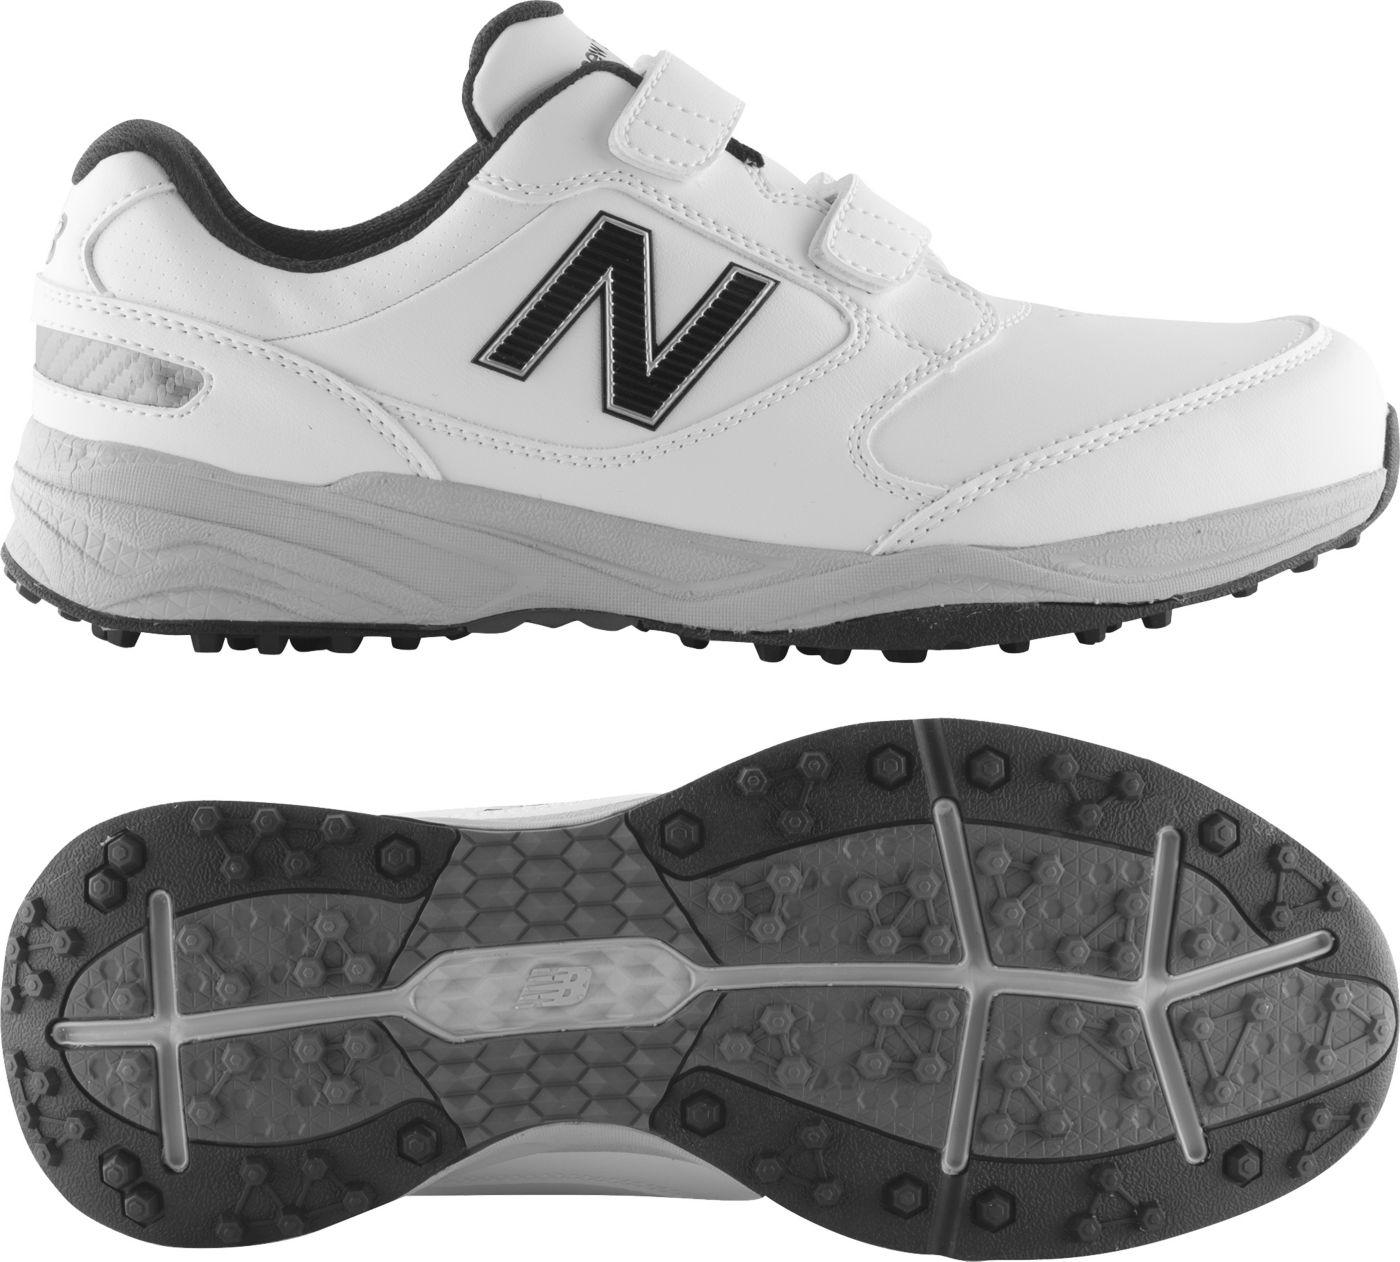 New Balance Men's CB'49 Golf Shoes